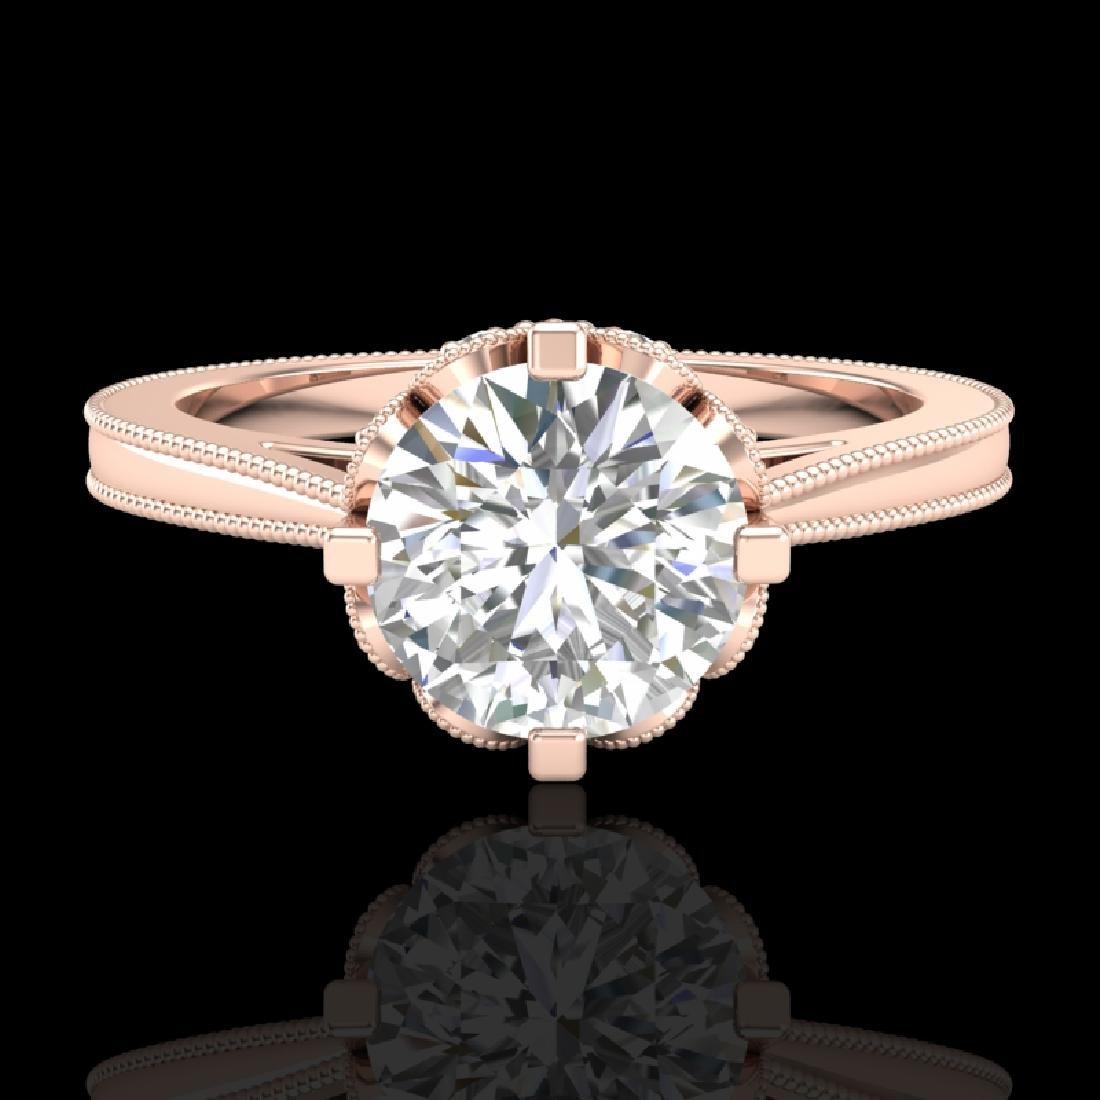 1.5 CTW VS/SI Diamond Art Deco Ring 18K Rose Gold - 2